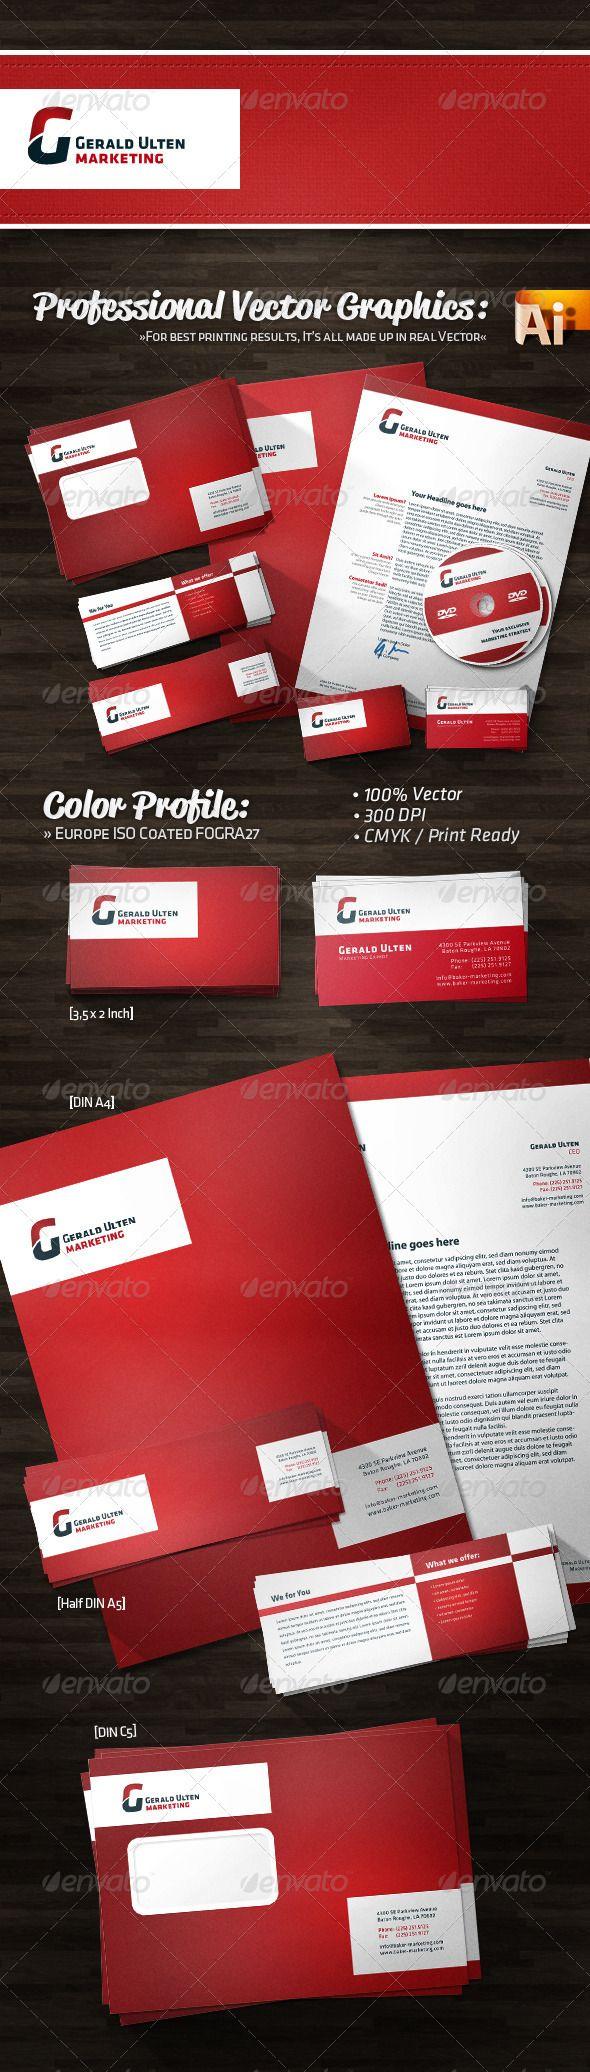 Bold Simple Marketing Corporate Identity